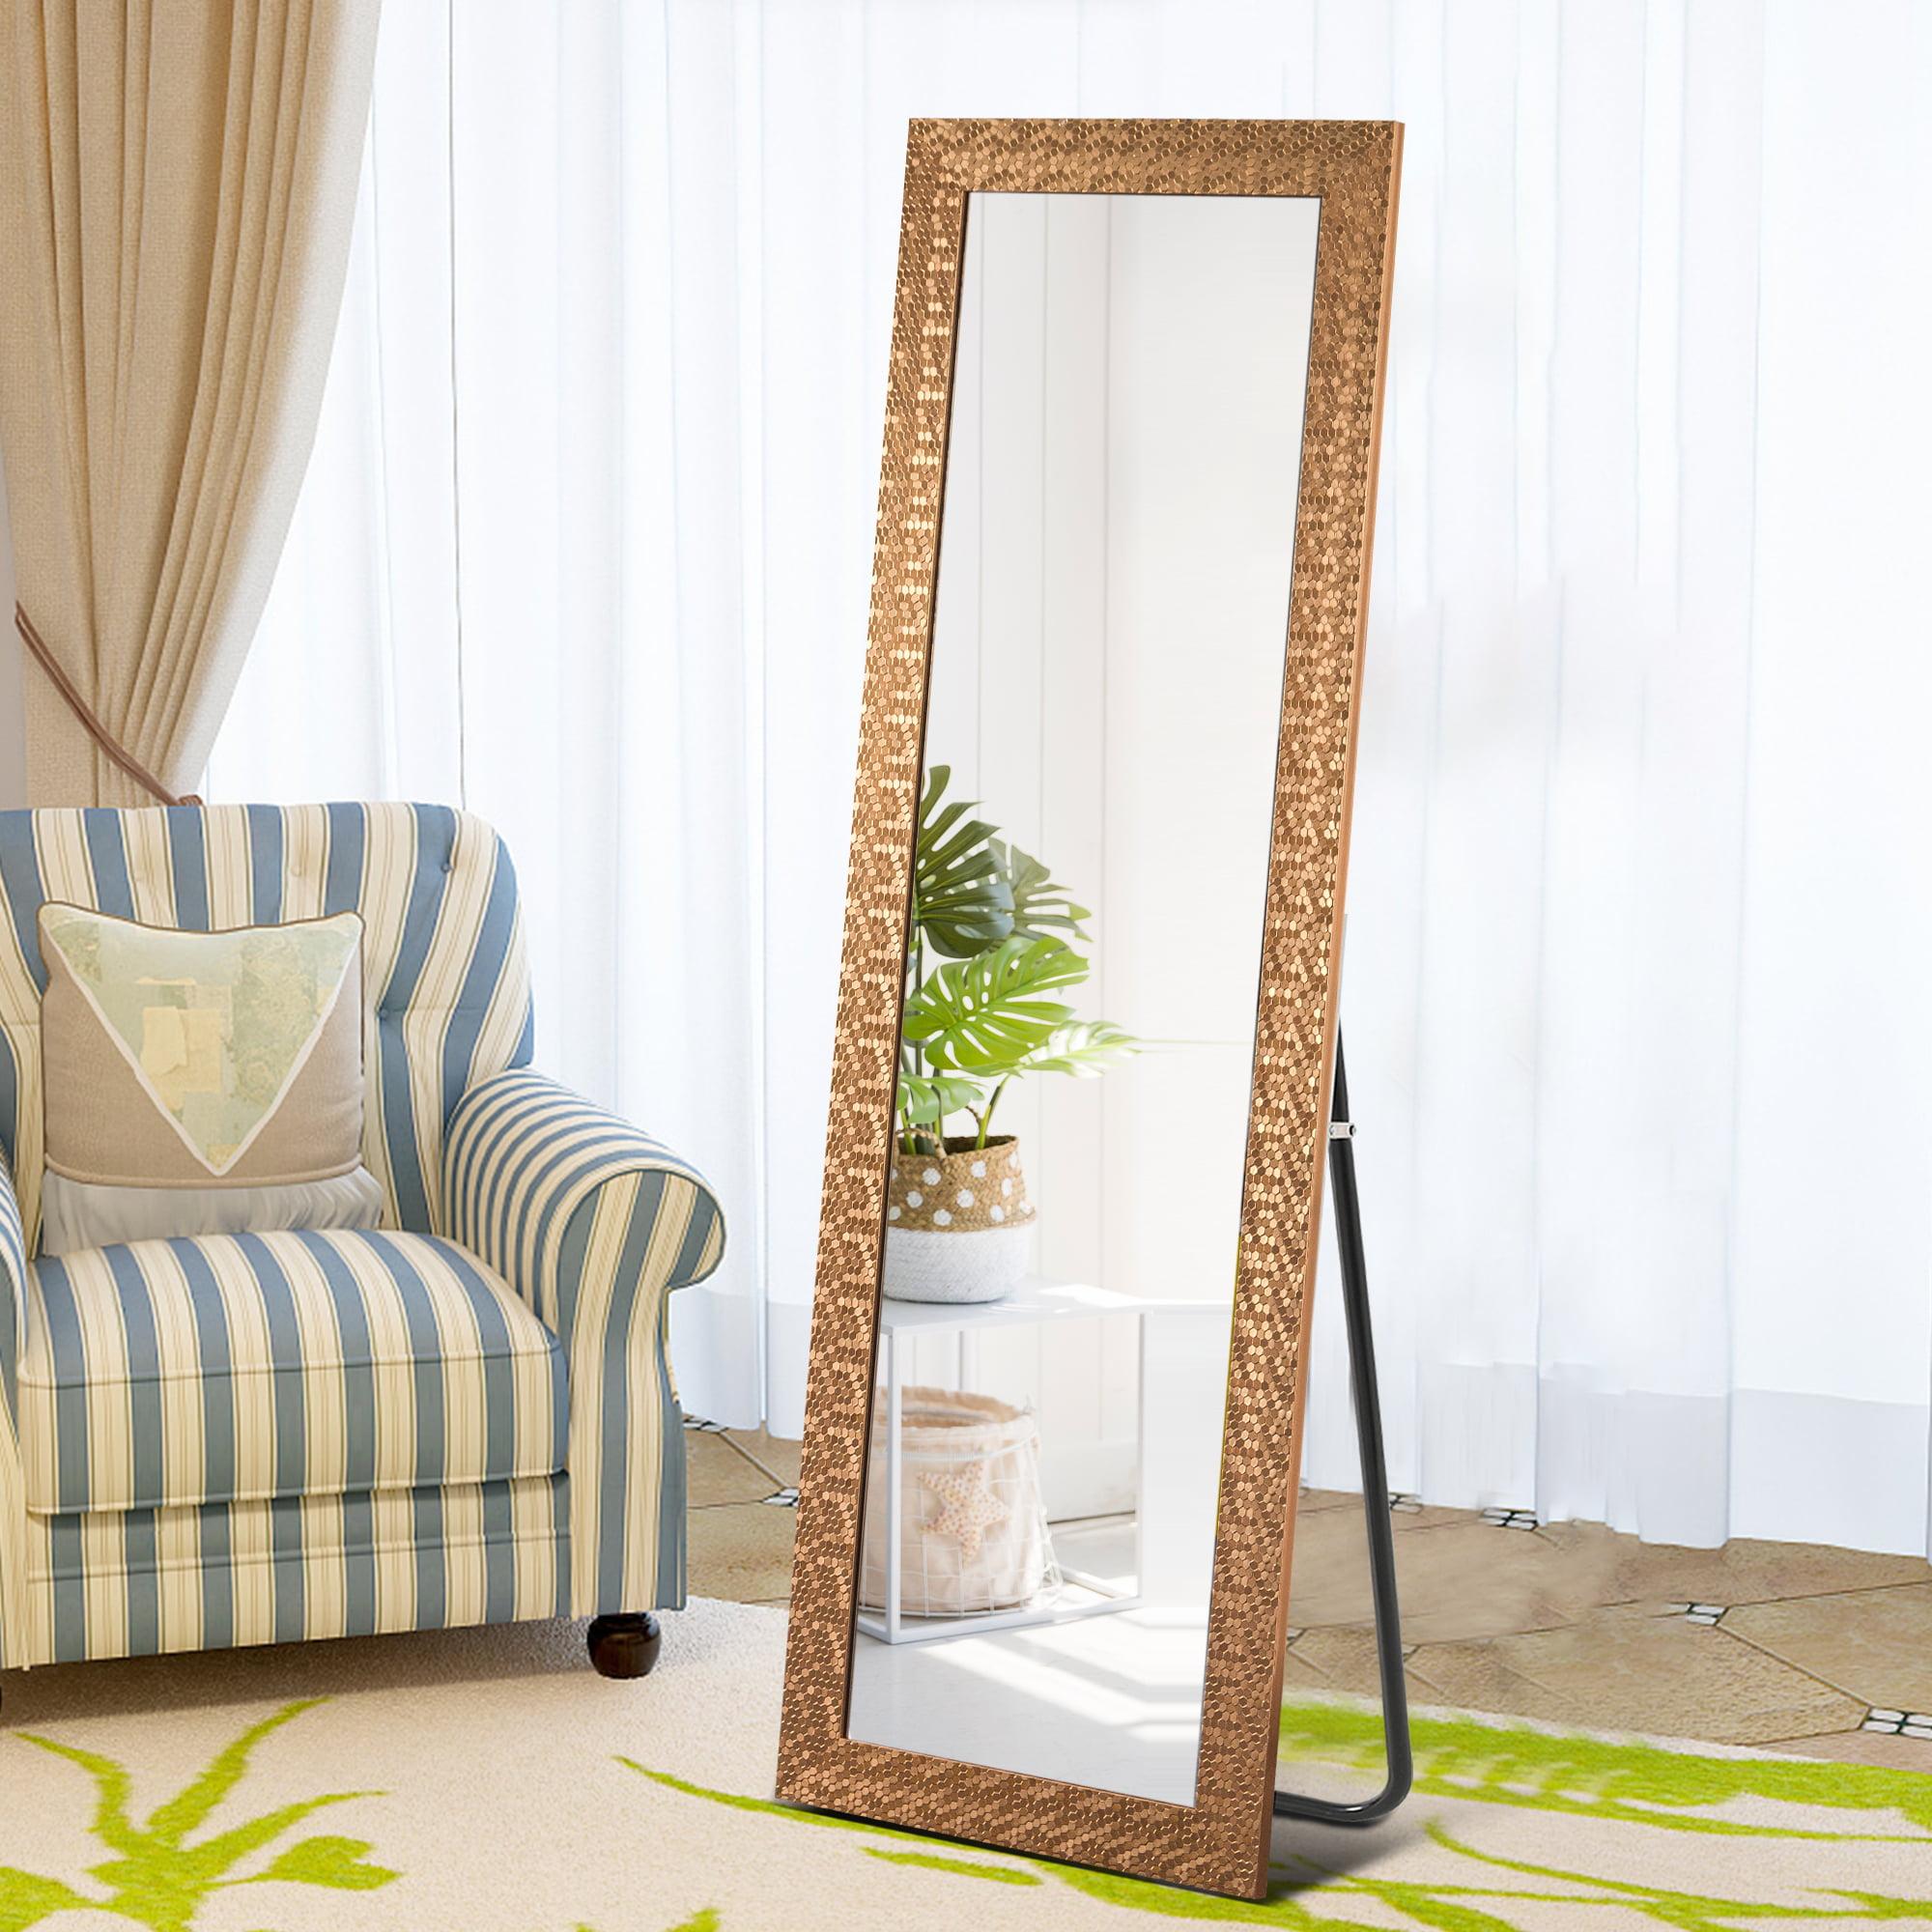 Neutype Full Length Mirror Decor Wall Mounted Mirror Floor Mirror With Standing Holder Mosaic Frame For Bathroom Bedroom Living Room Dining Room Entry Gold 65 X22 Walmart Com Walmart Com